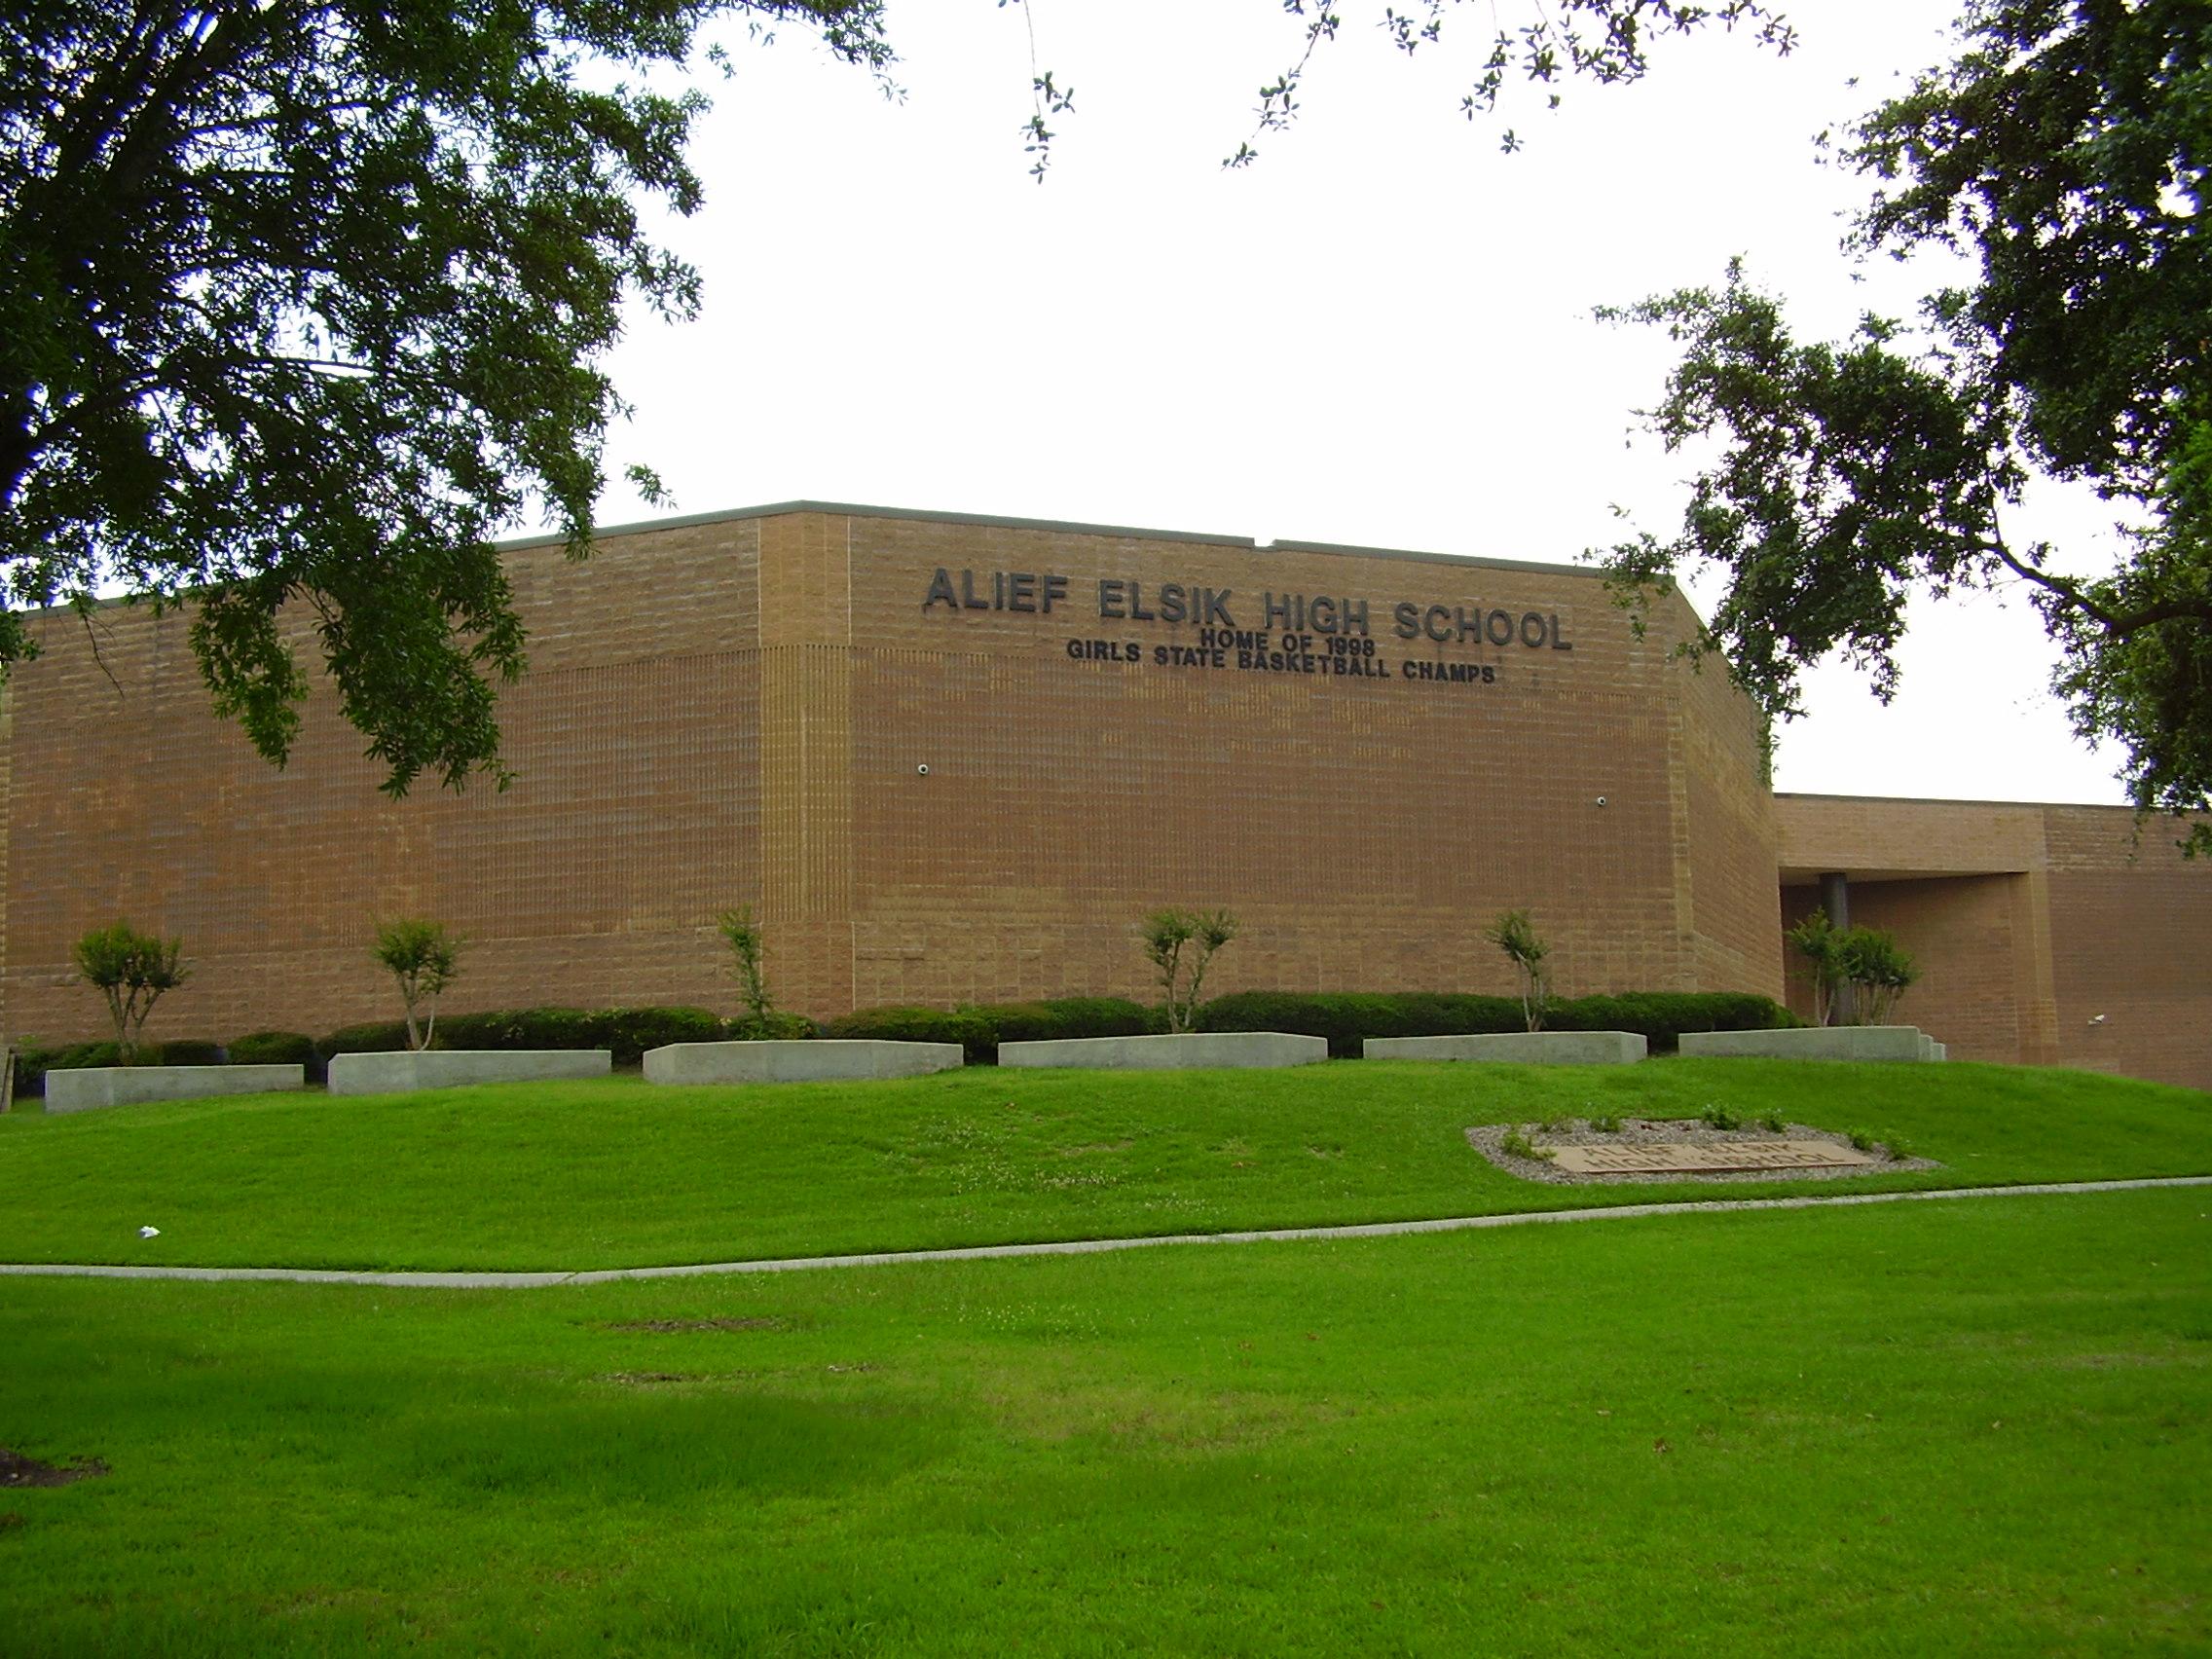 Hcc Alief Campus Map.Alief Elsik High School Wikipedia